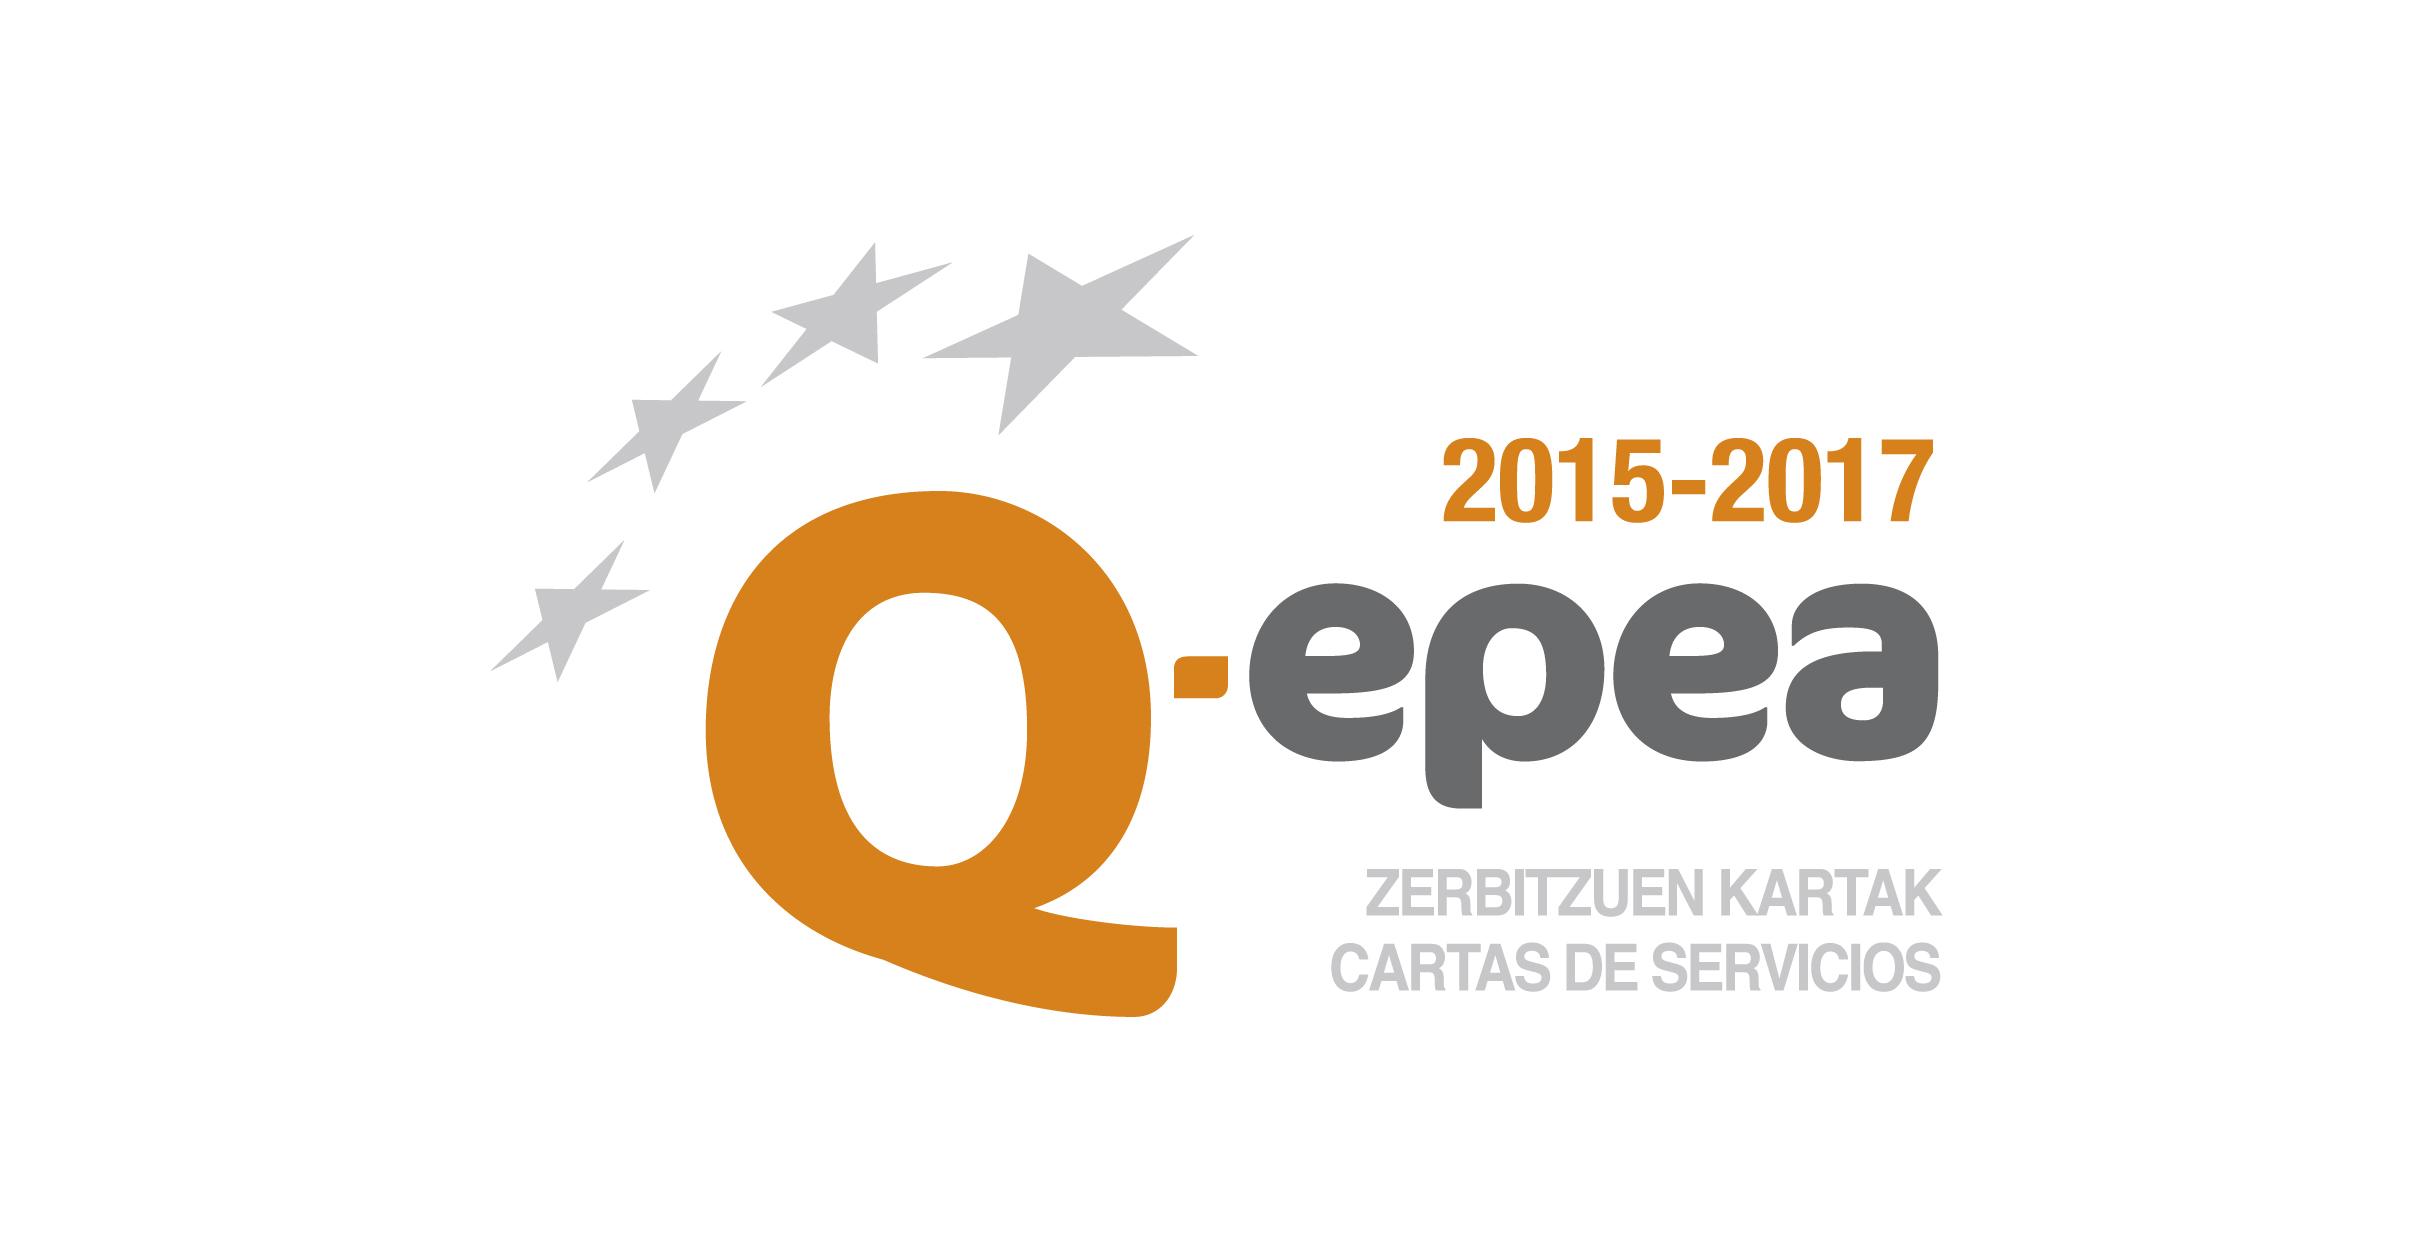 Q-epea